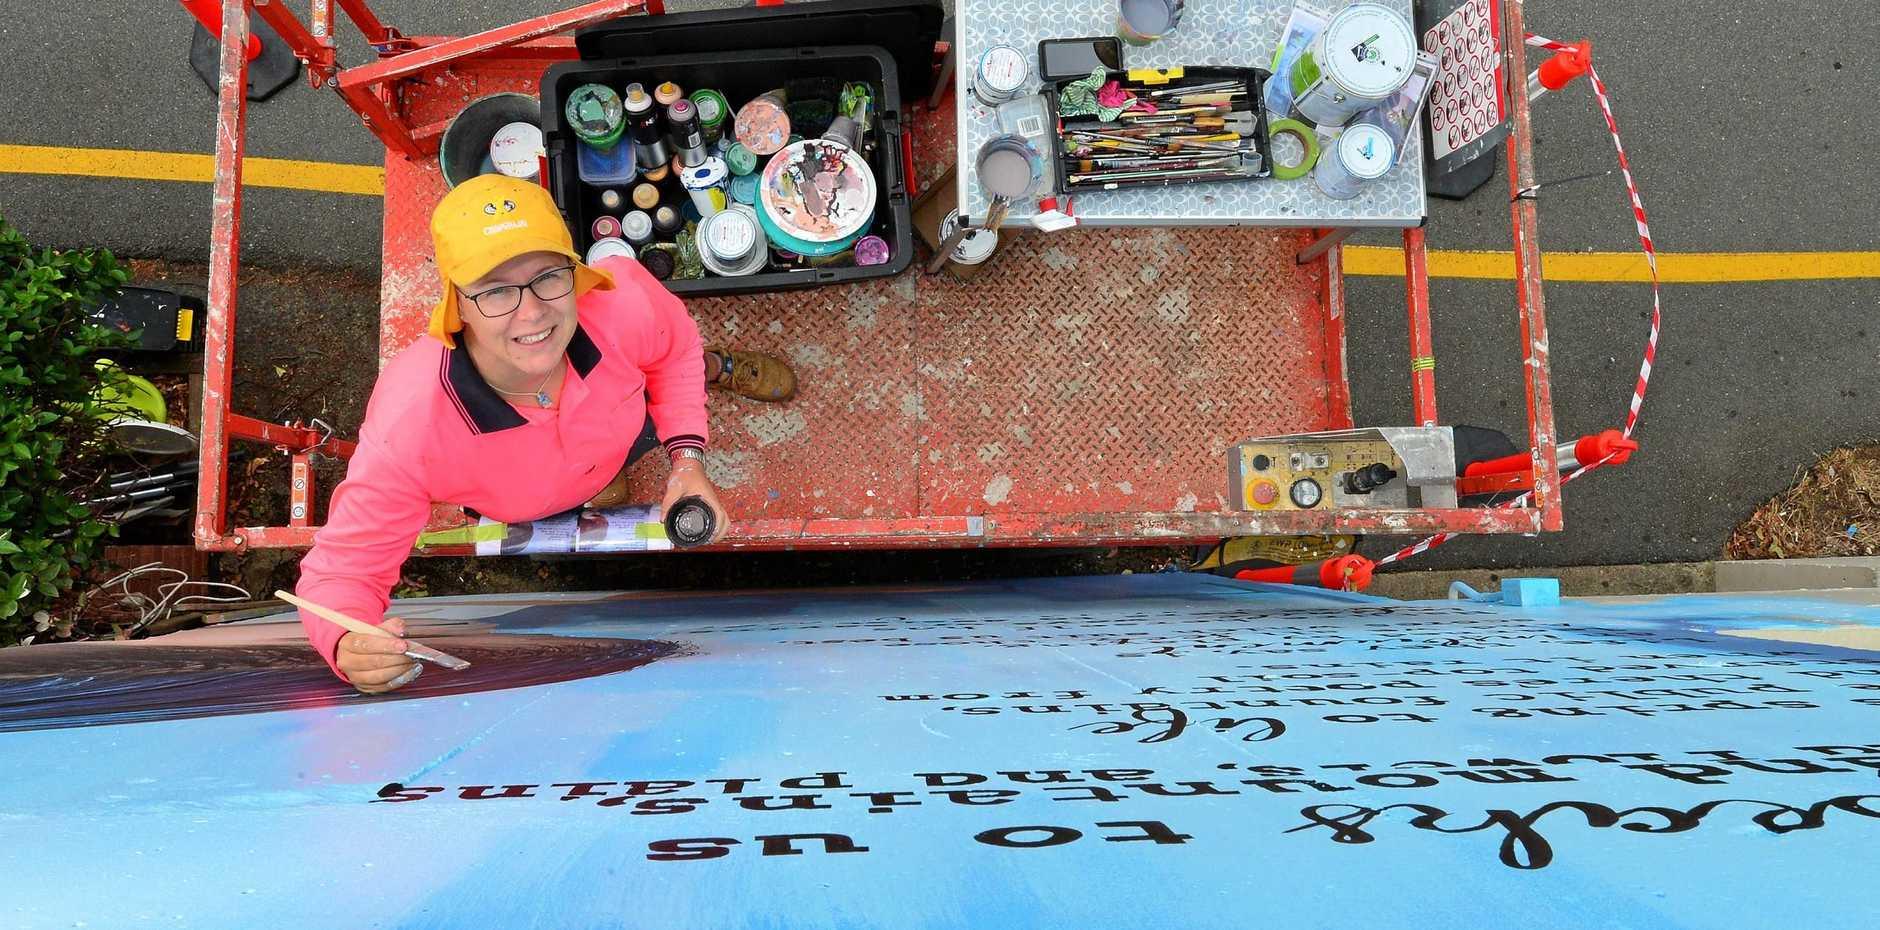 Mieke van den Berg puts her creative touch to a mural in Lamkin Lane in Caloundra.